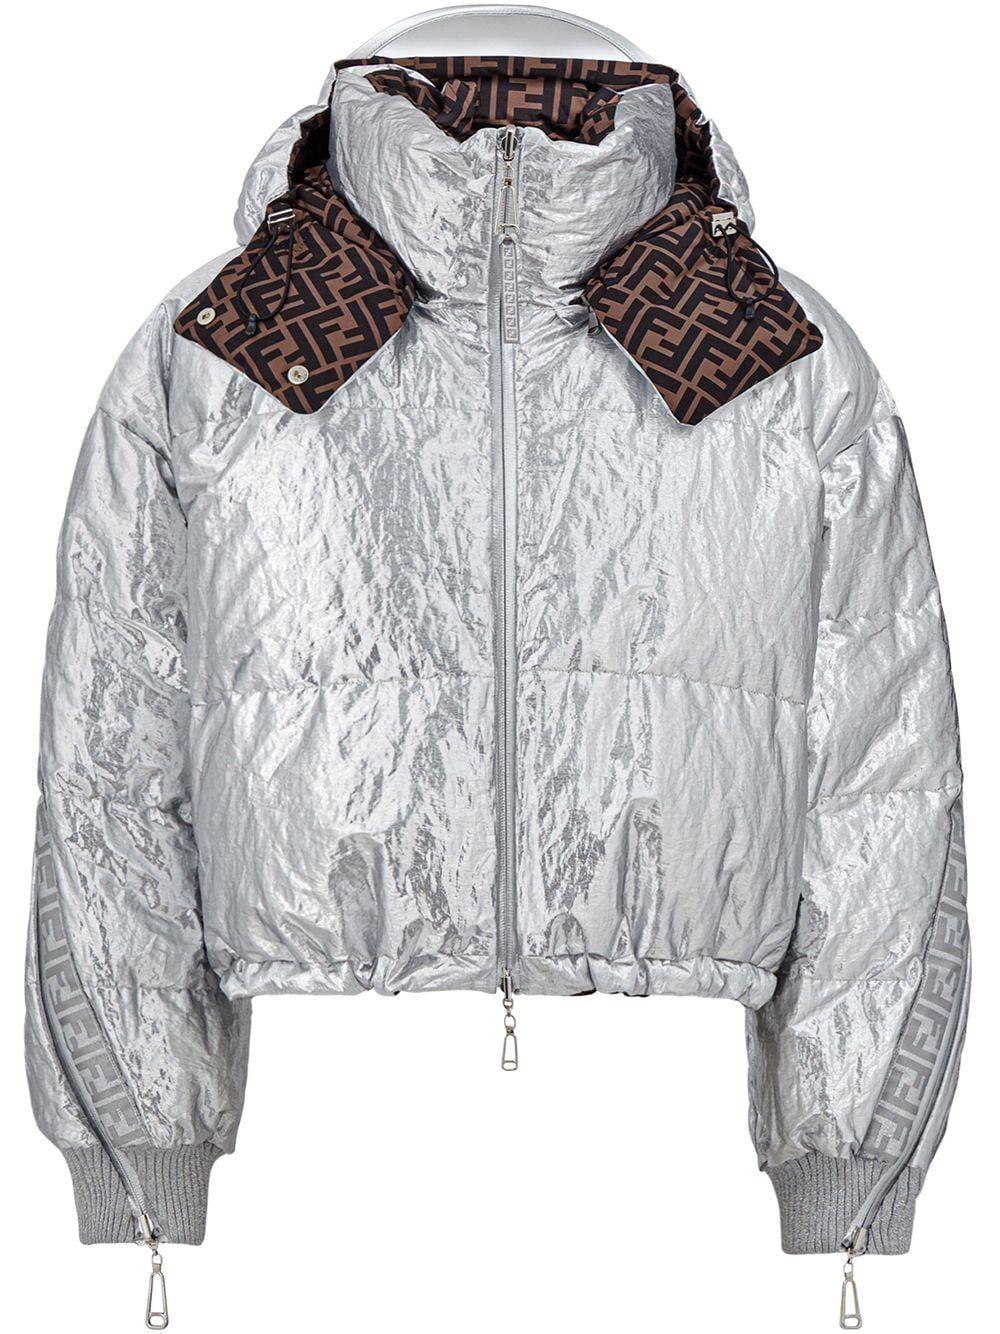 Fendi Fendi Prints On Reversible Padded Jacket Metallic Jackets Fendi Fendi Clothing [ 1334 x 1000 Pixel ]